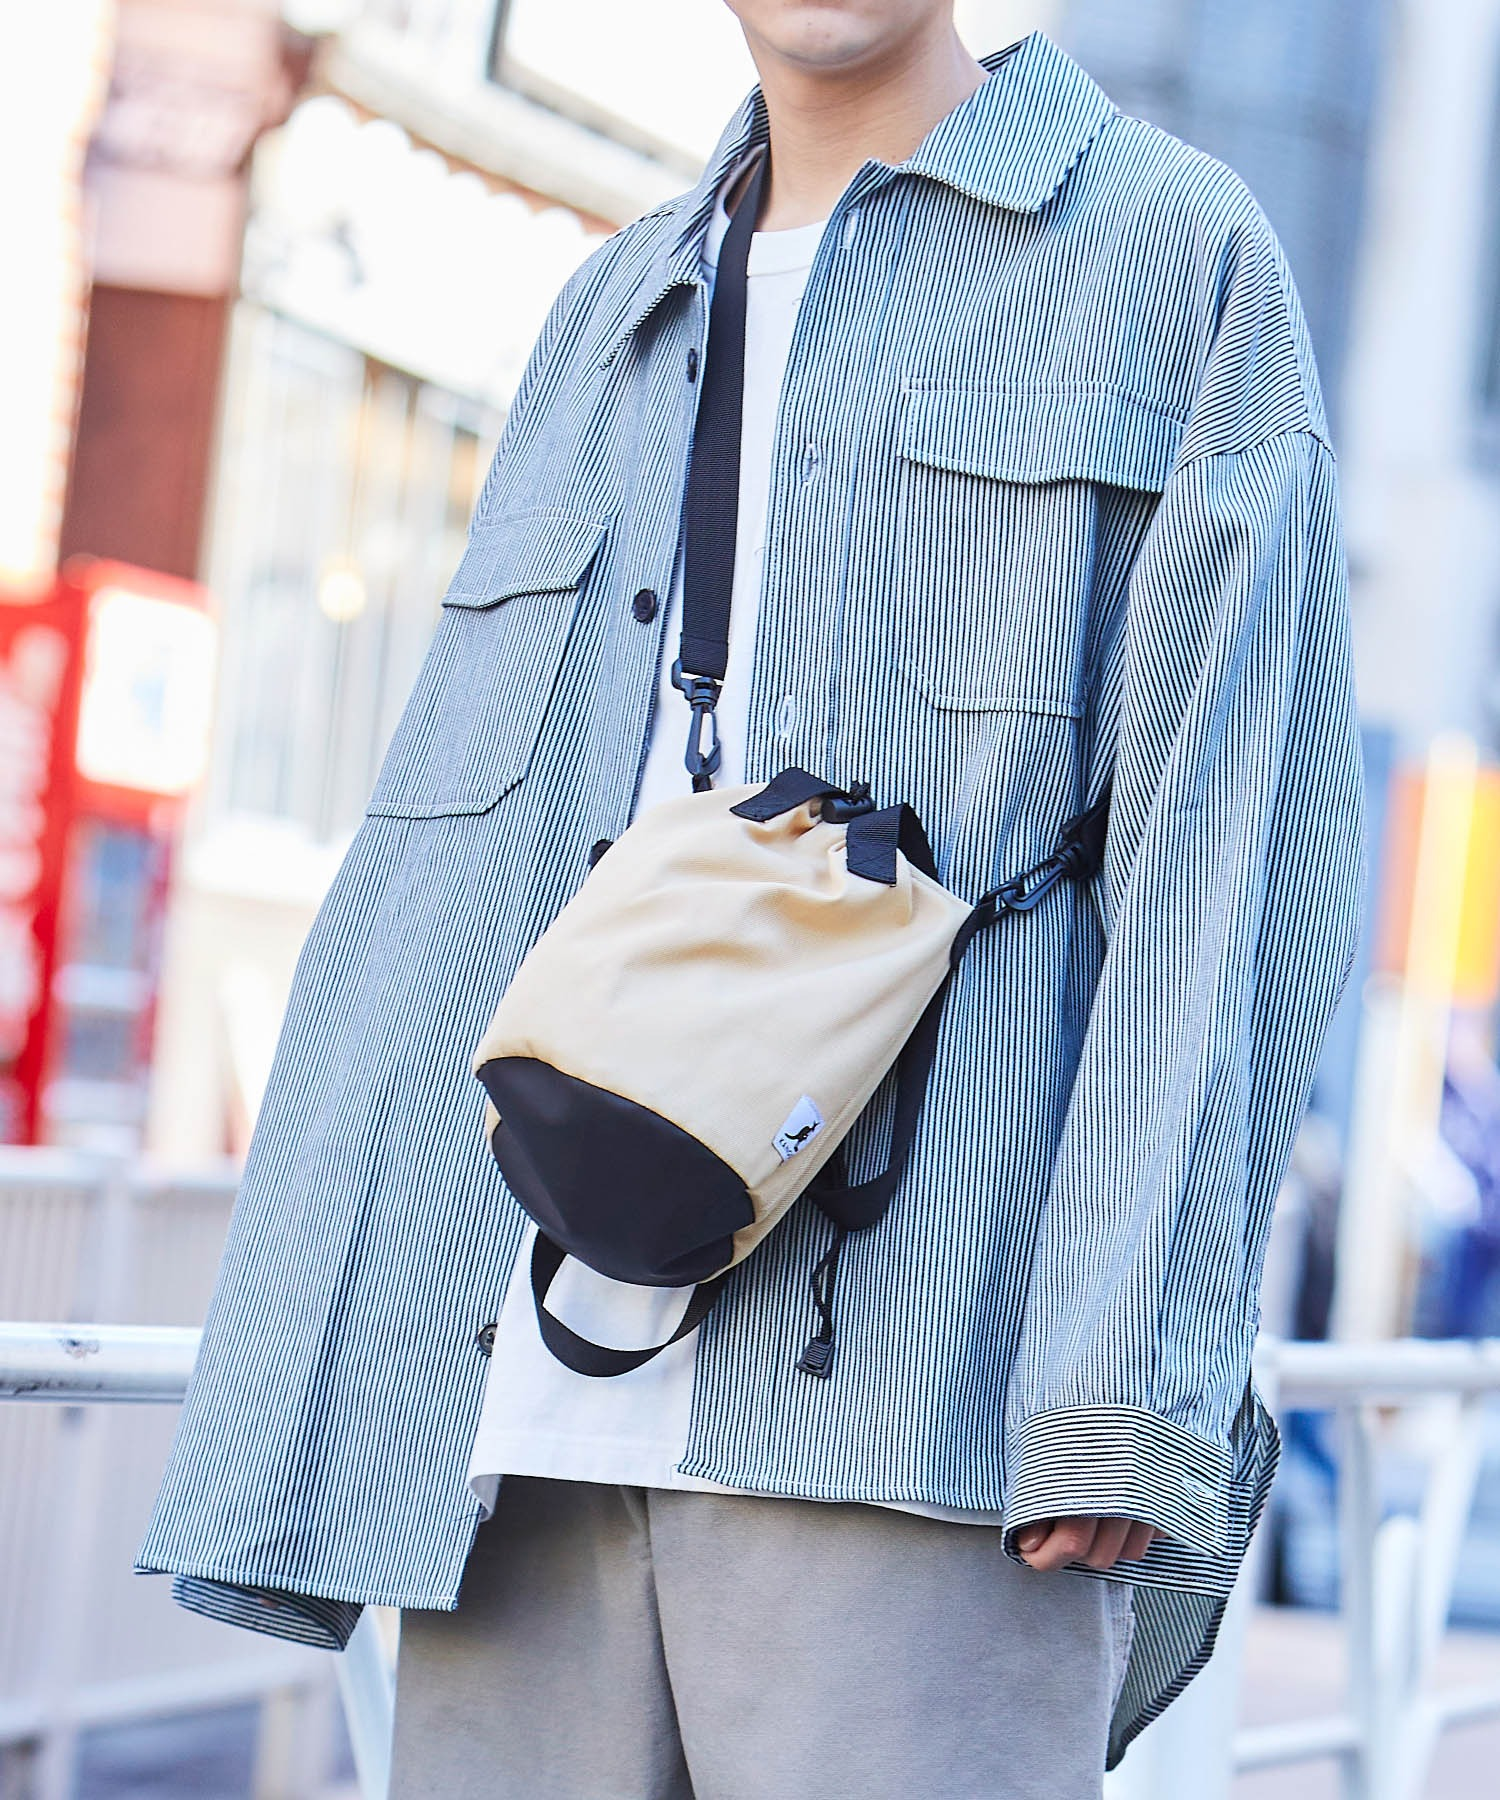 KANGOL/カンゴール MONO-MART別注 ショルダーバッグ 巾着バッグ